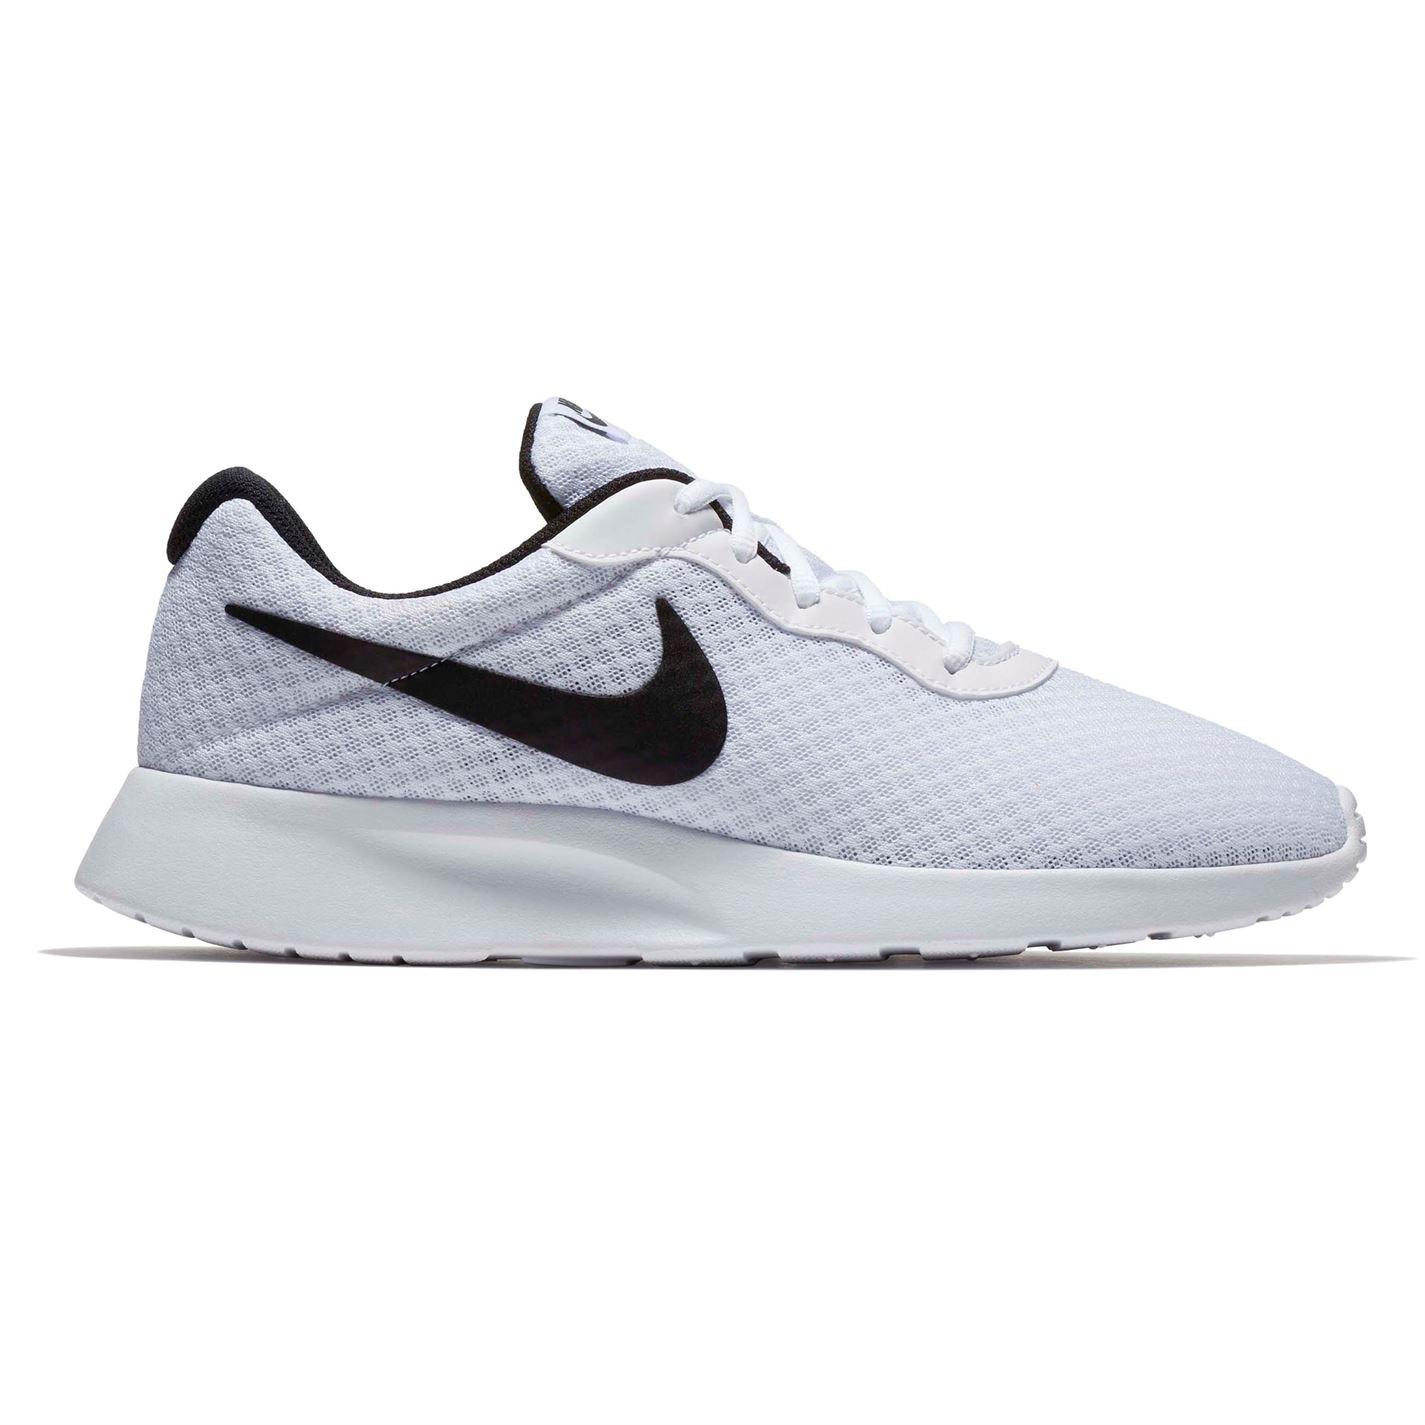 Nike Tanjun Pánské tenisky - Glami.sk 6fdda7276a